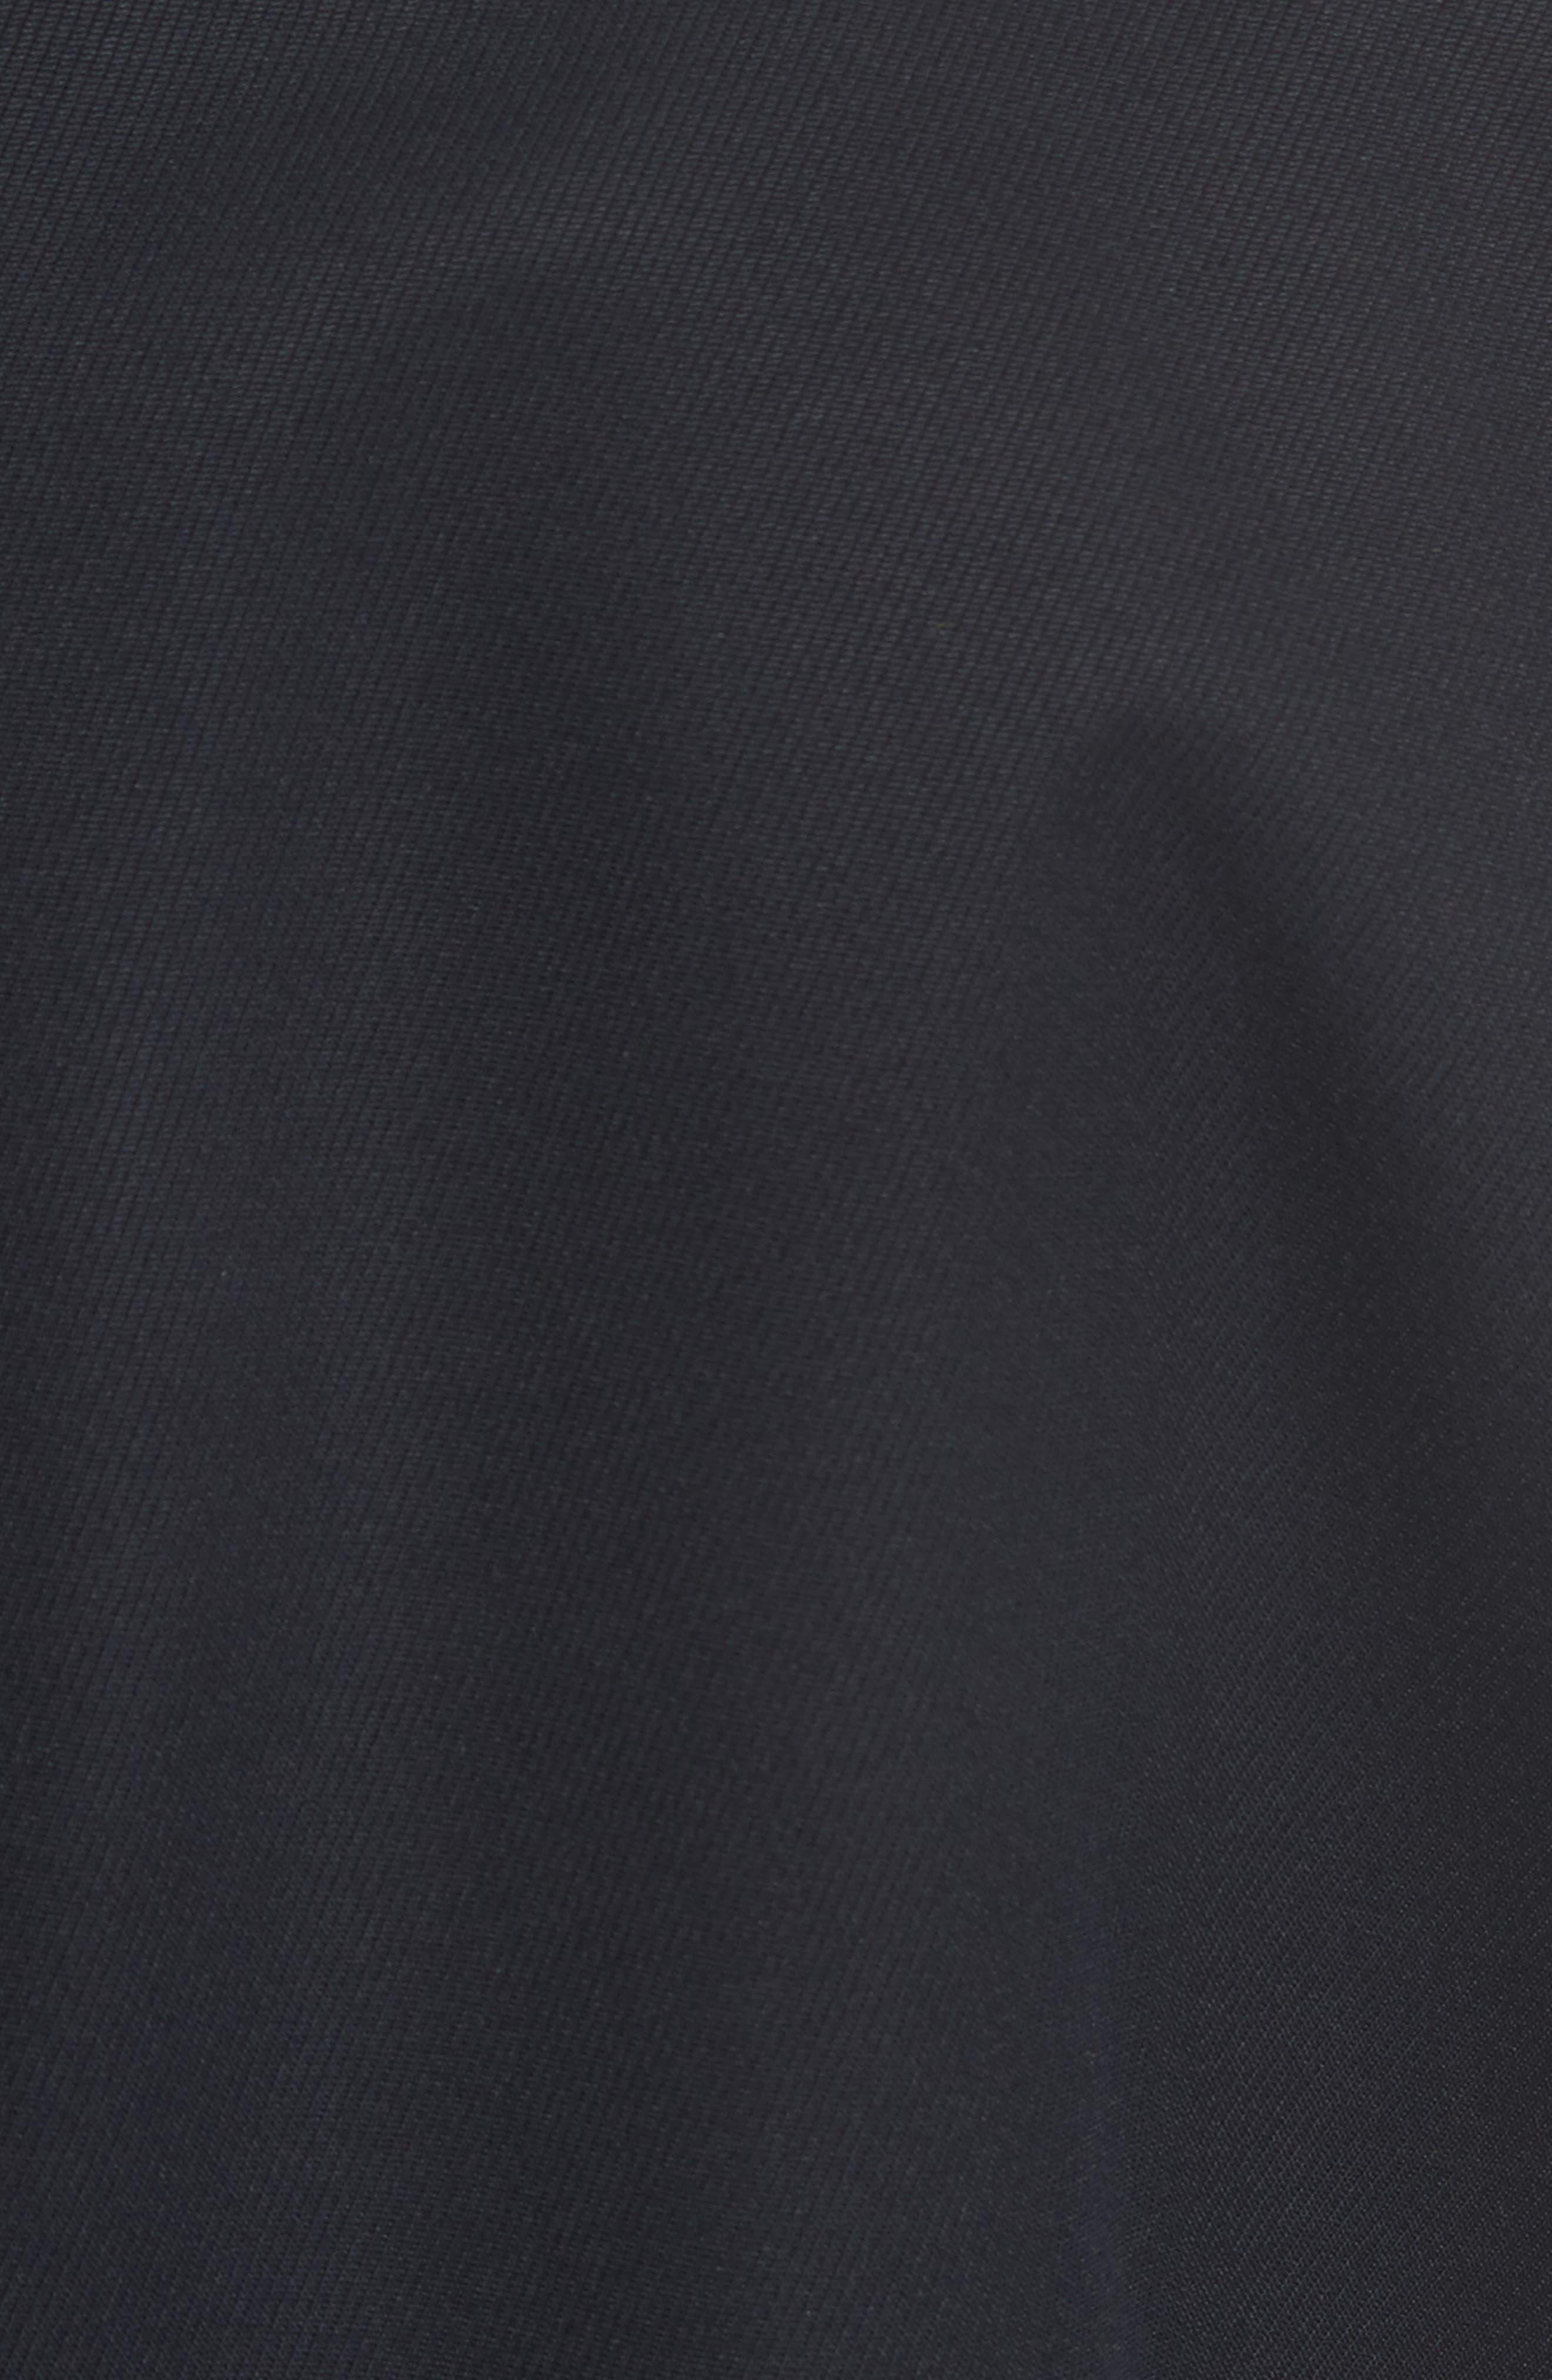 Navy Topcoat,                             Alternate thumbnail 4, color,                             Navy